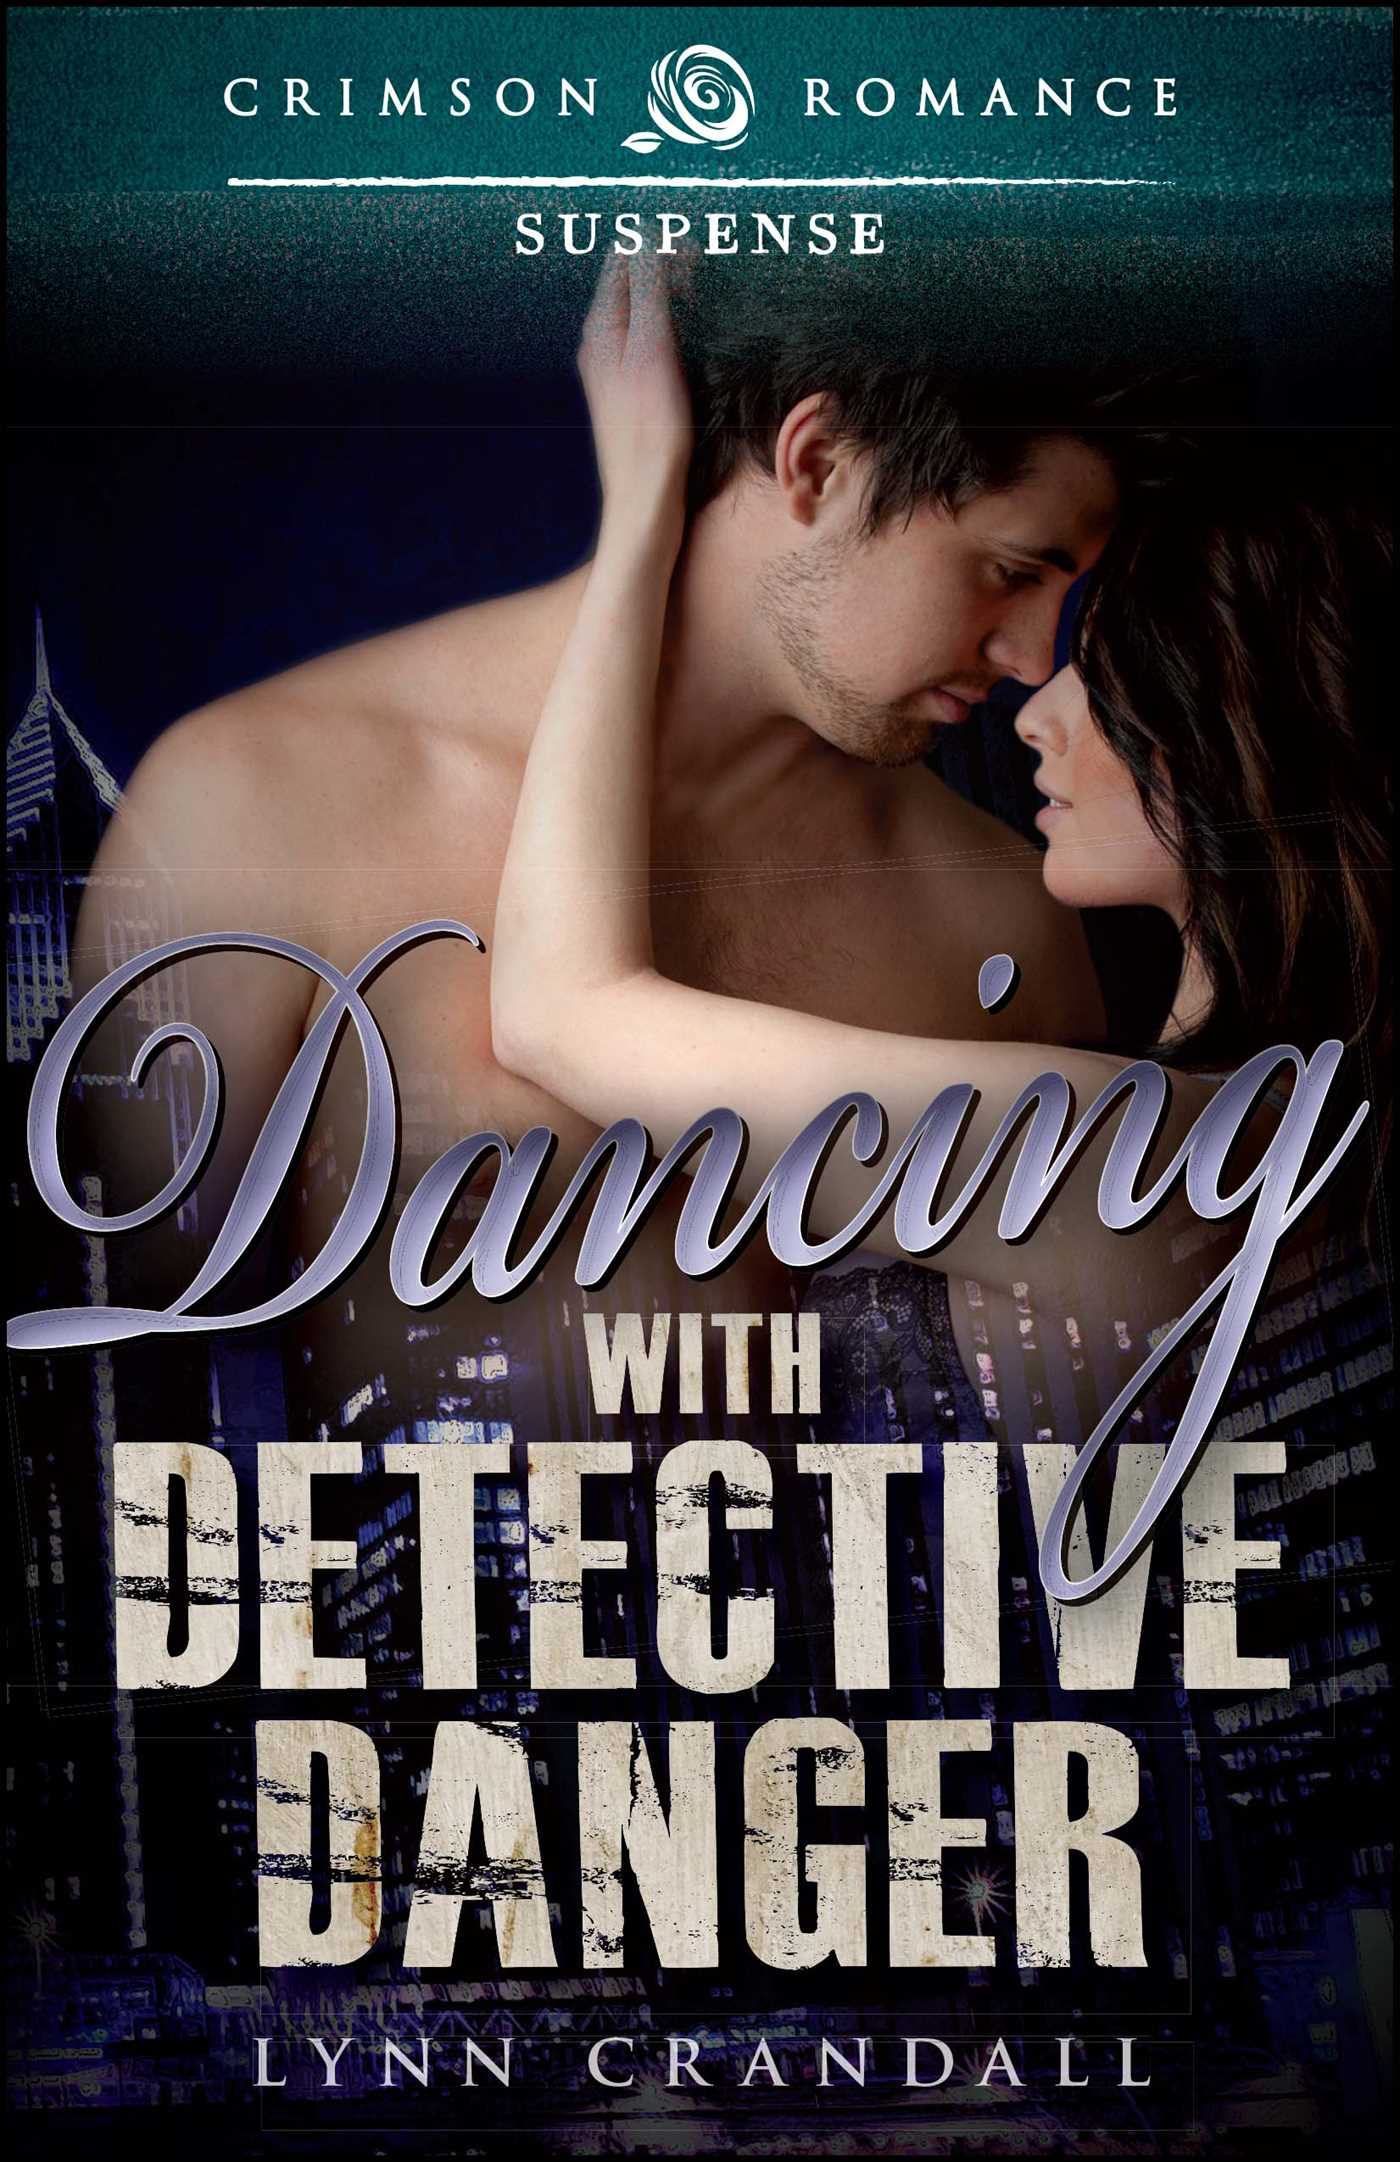 Dancing with detective danger 9781440564055 hr